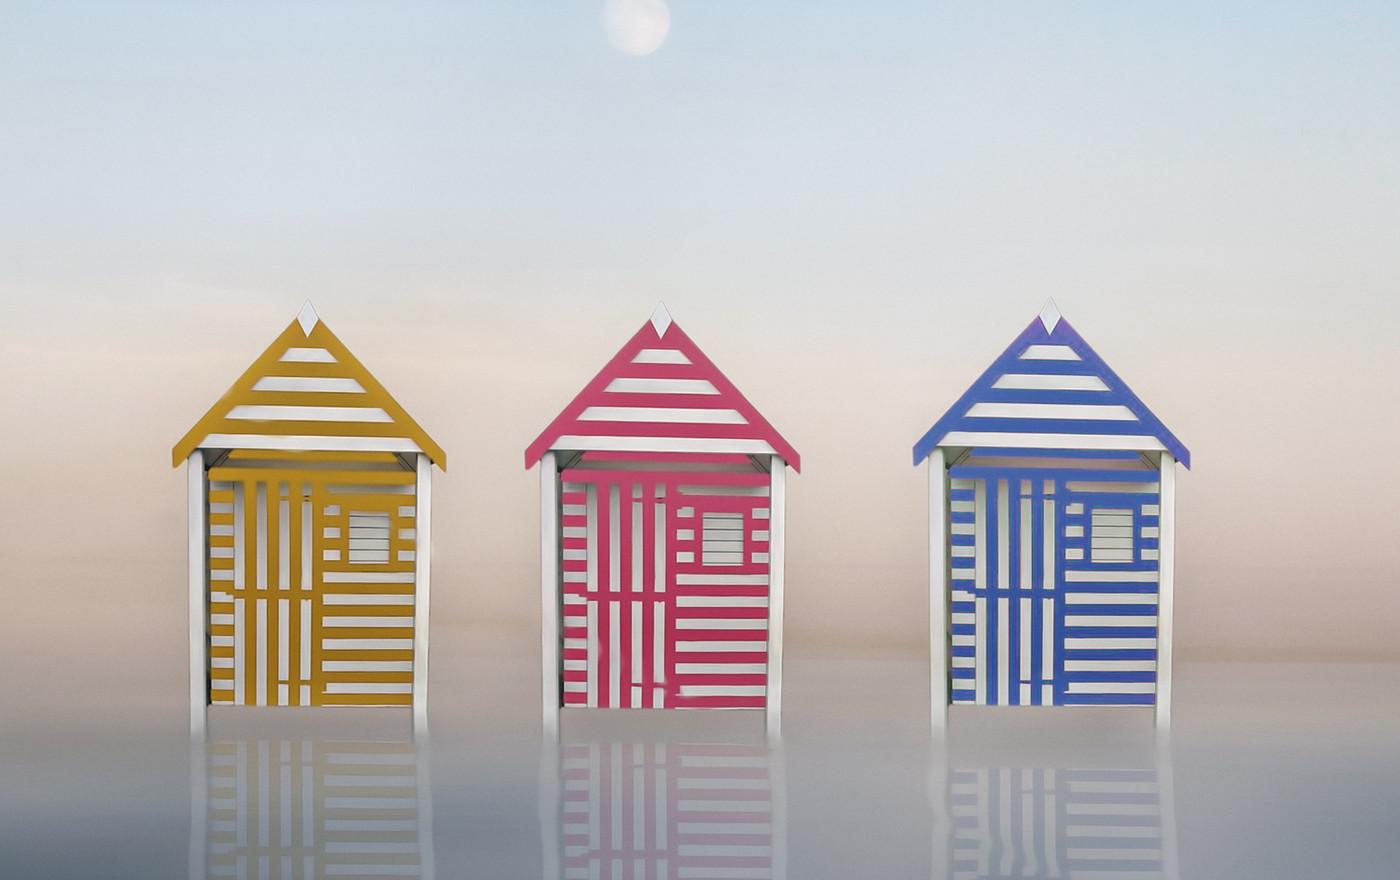 STRIPED BEACH HUTS by Pam Sherren